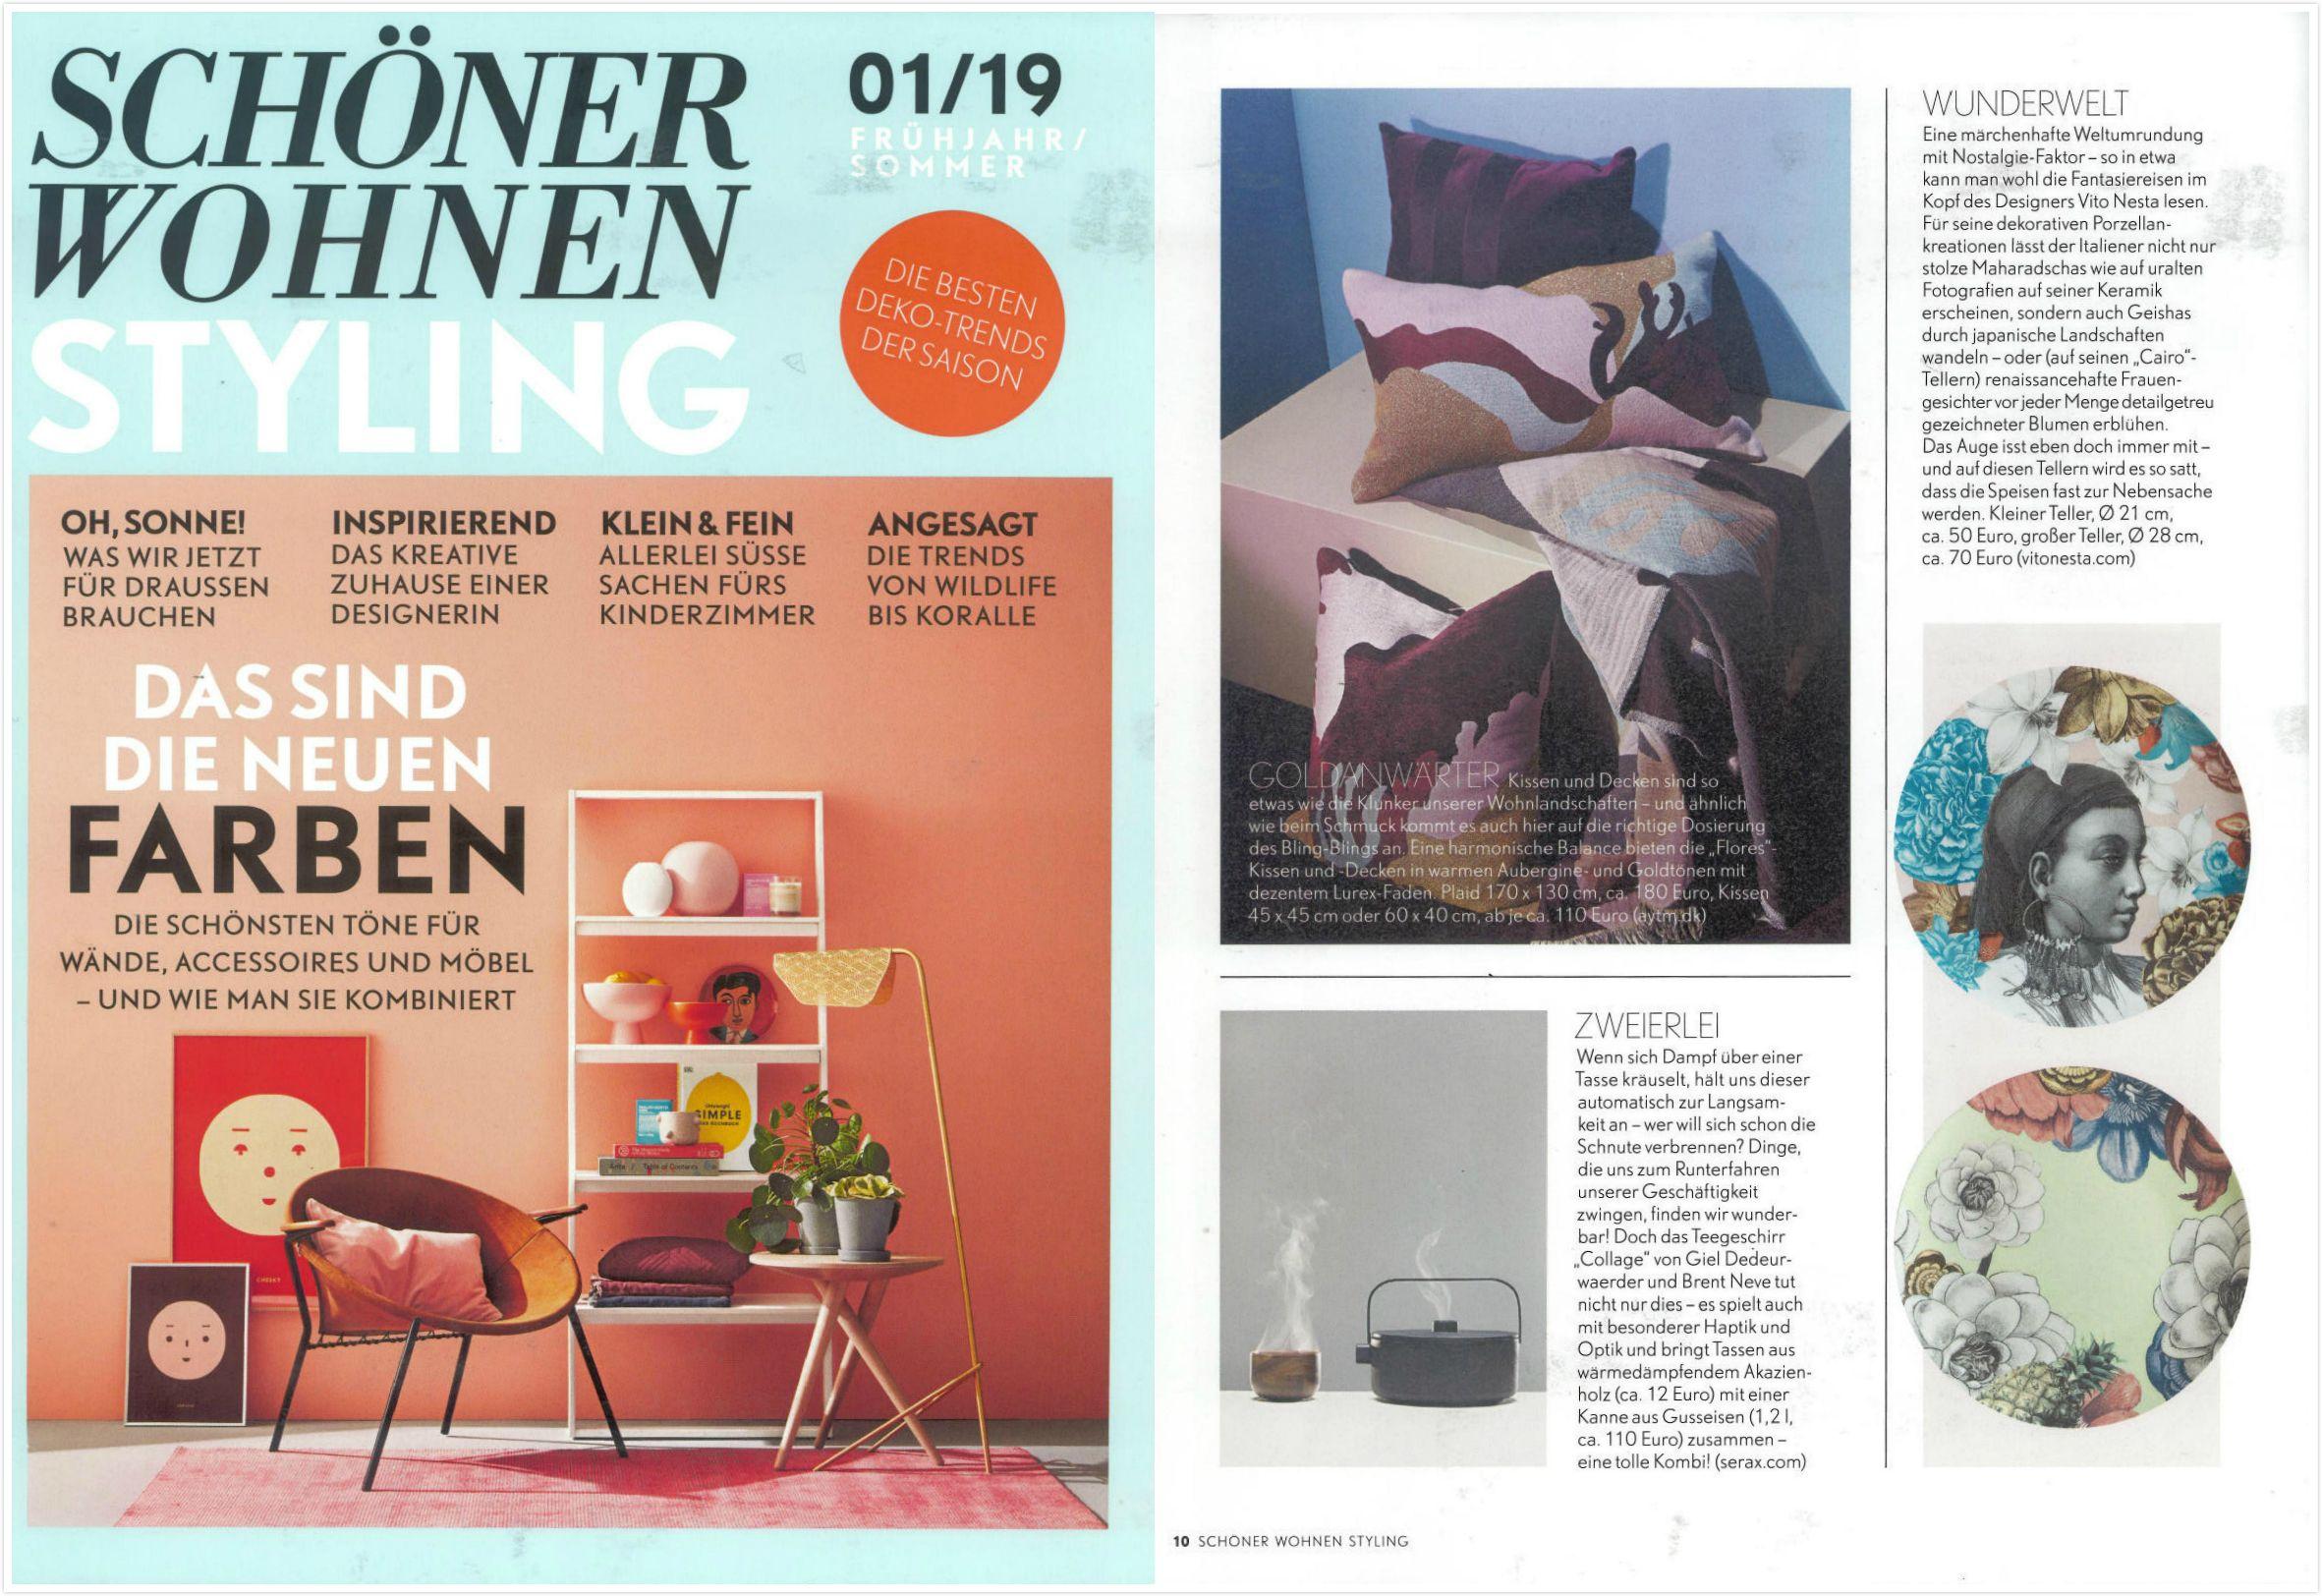 Aytm S Flores Series Mentioned In Schoner Wohnen Styling Summer Edition 2019 Design Home Decor Decor